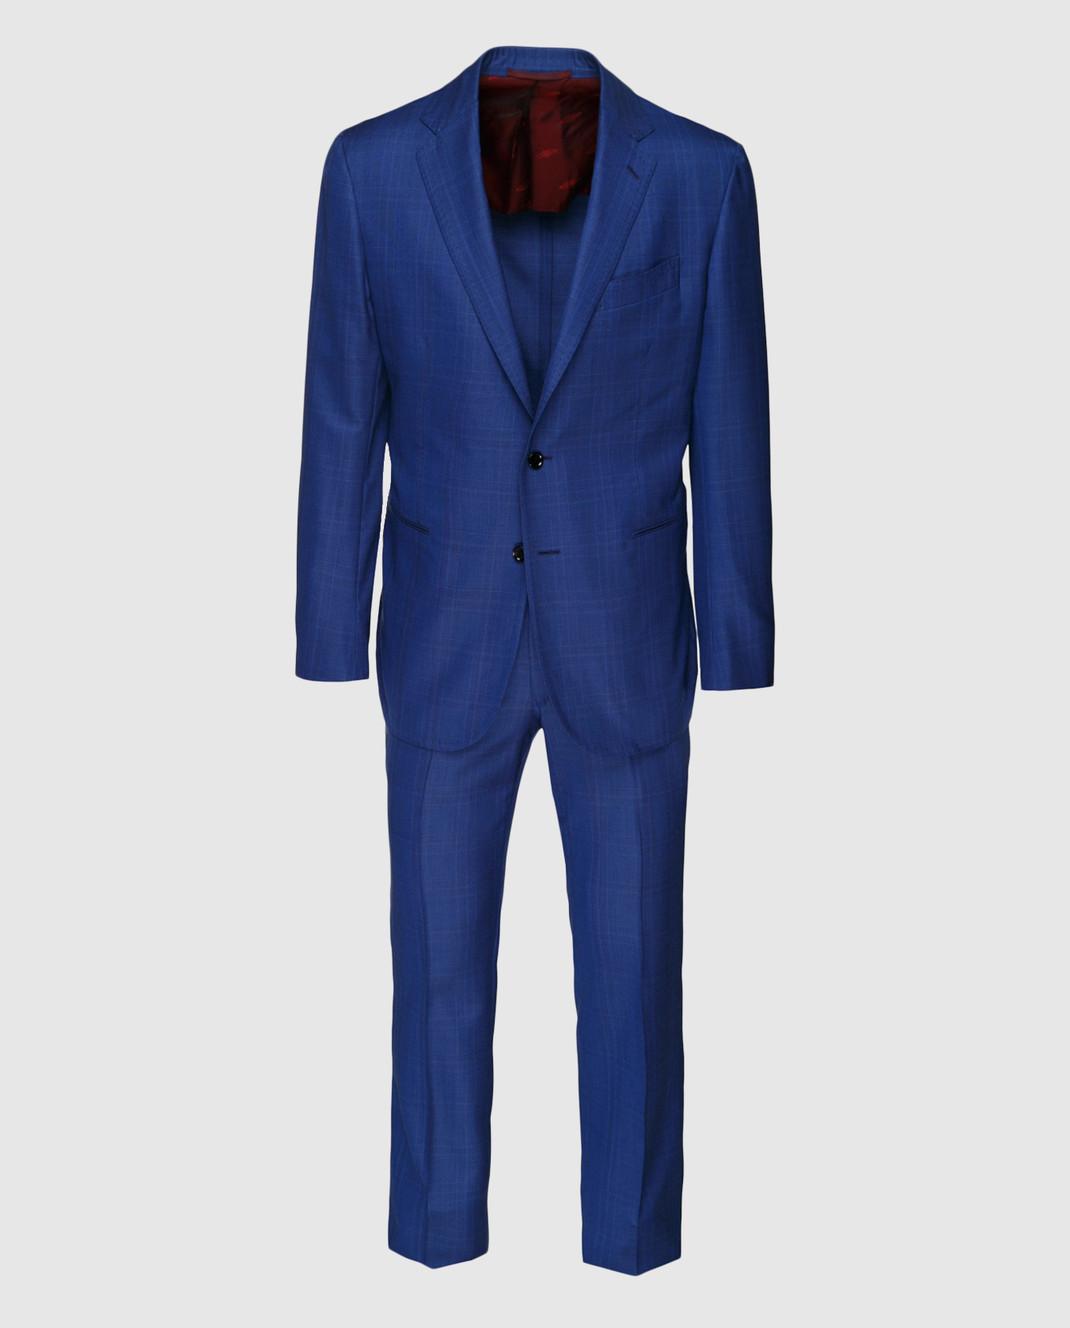 Stile Latino Синий костюм из шерсти AULUCA20A21SWA14